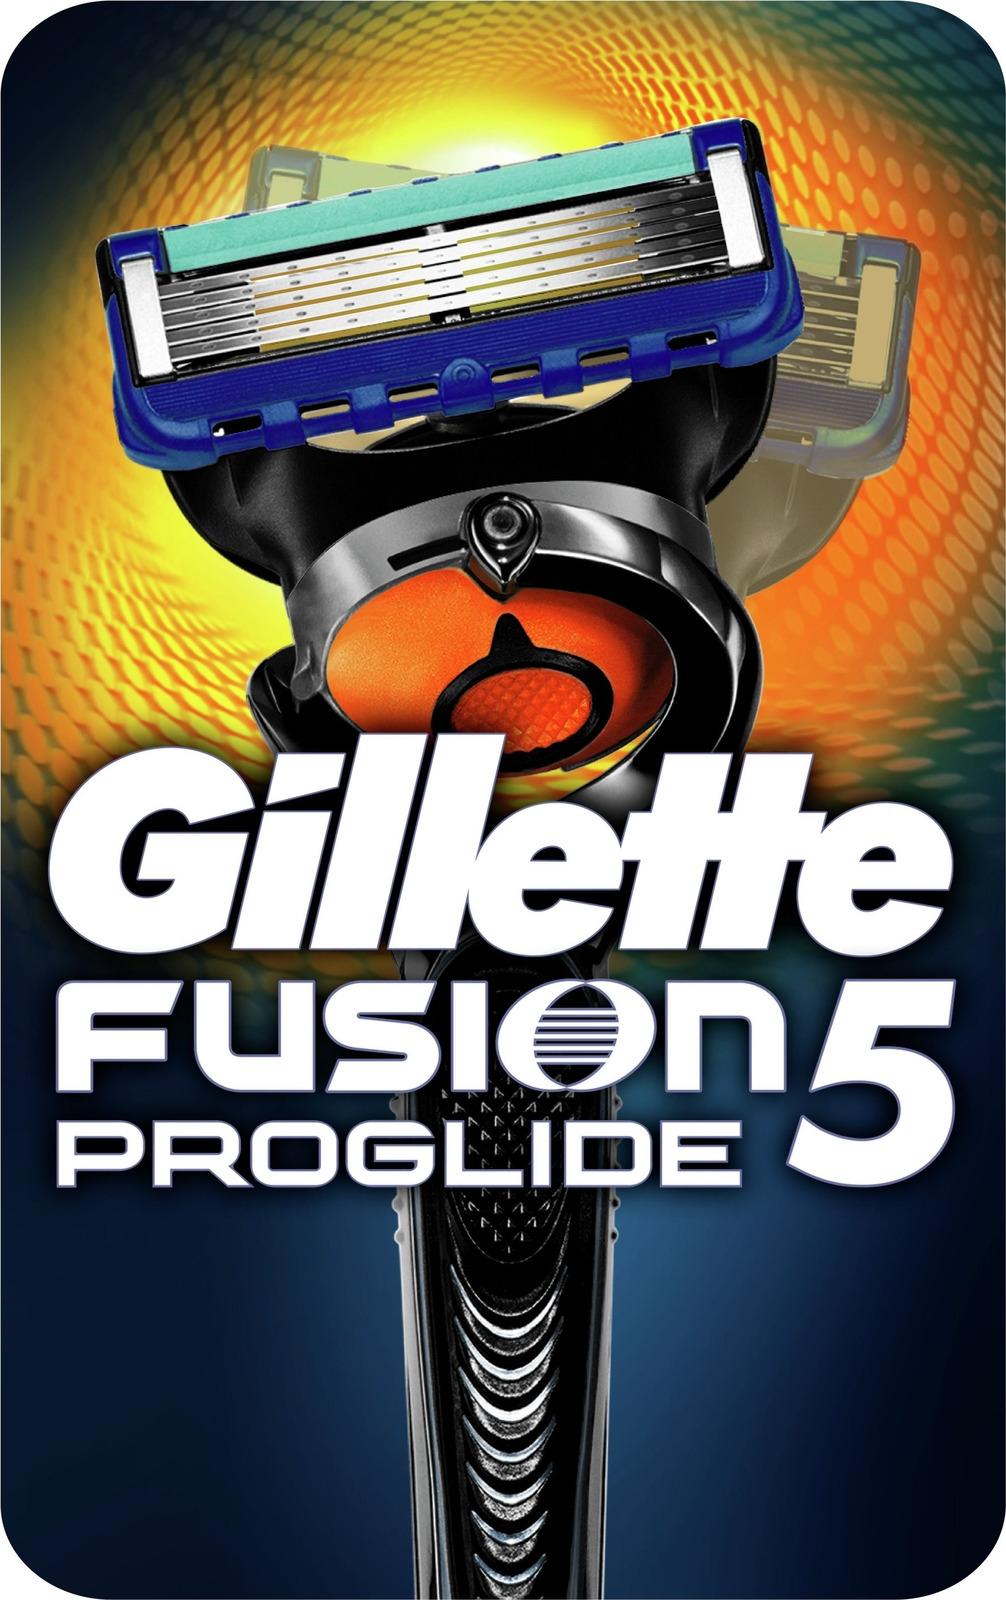 Мужская Бритва Gillette Fusion5 ProGlide с Технологией FlexBall